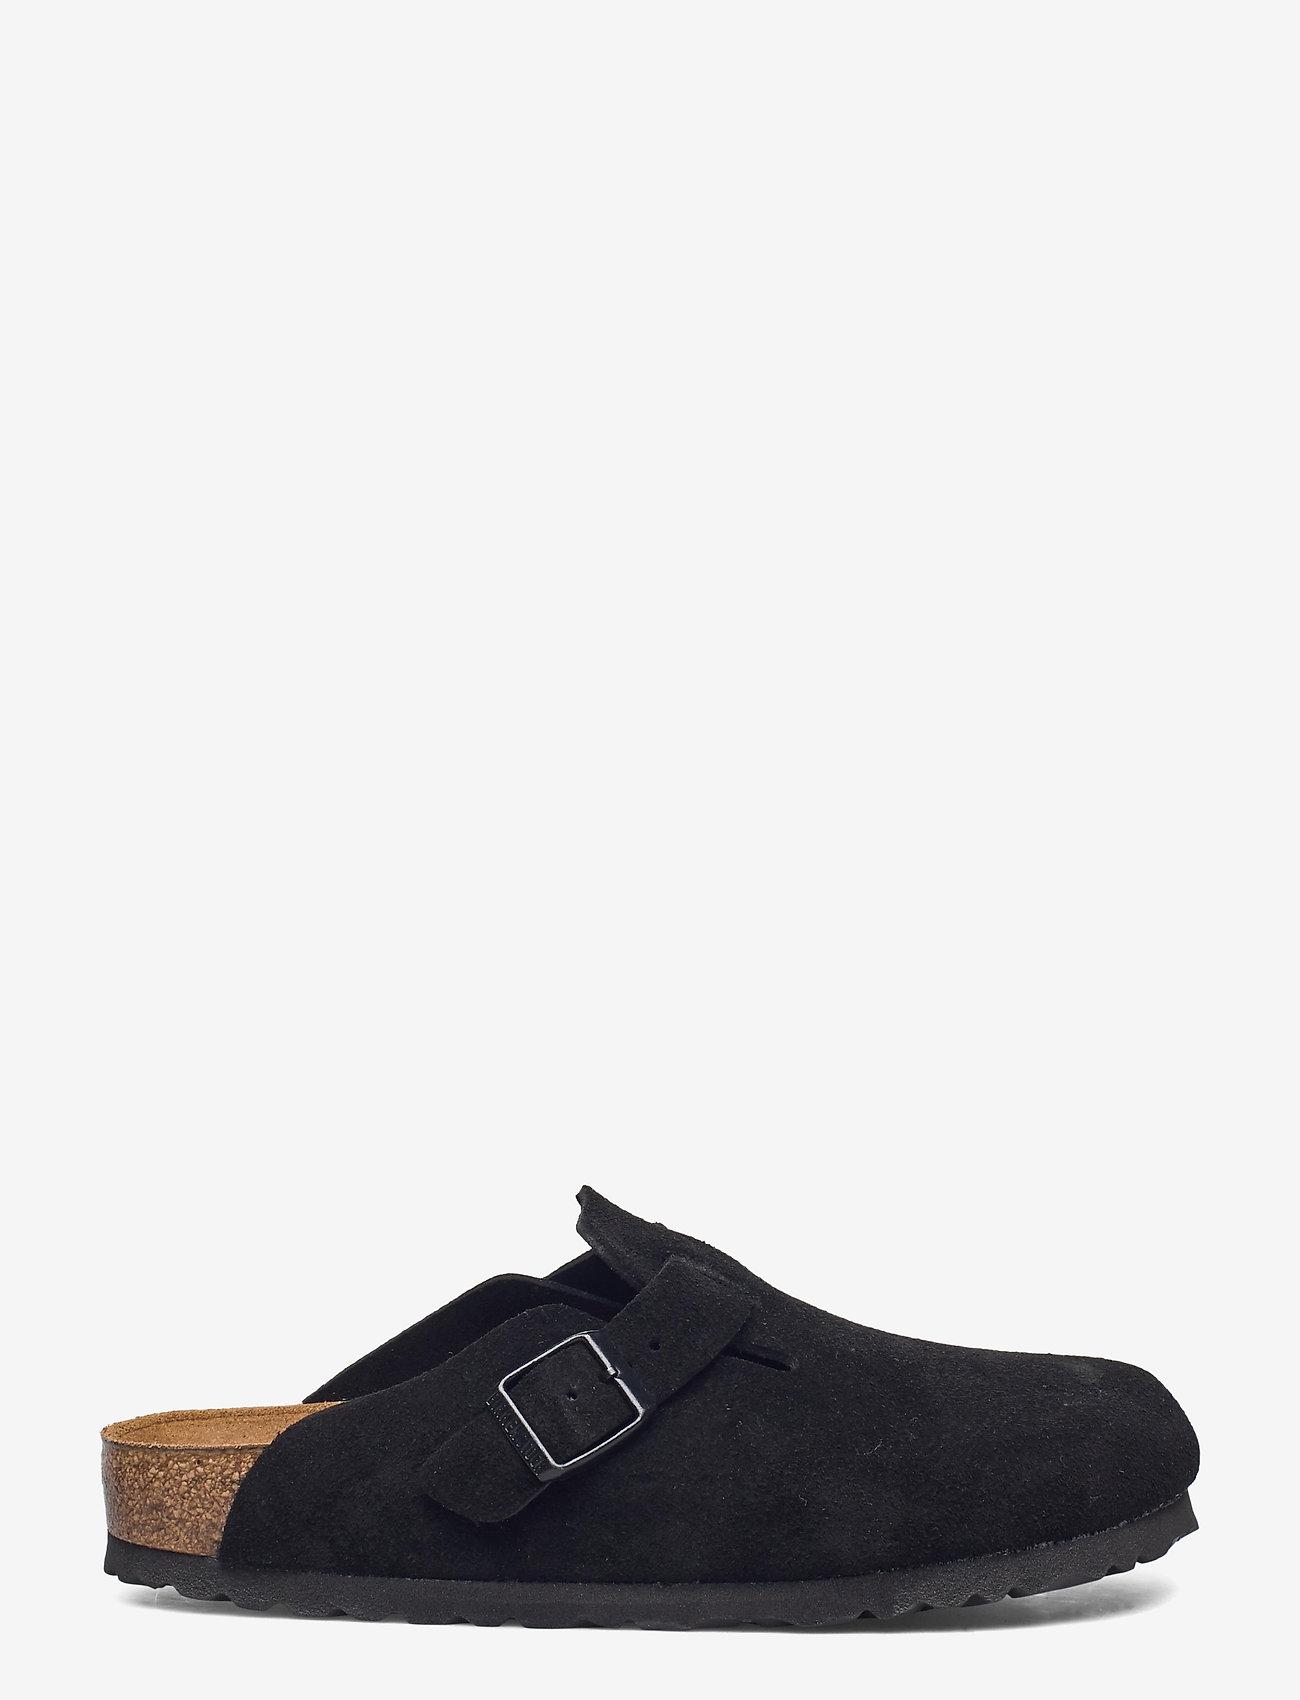 Birkenstock - Boston Soft Footbed - black - 1